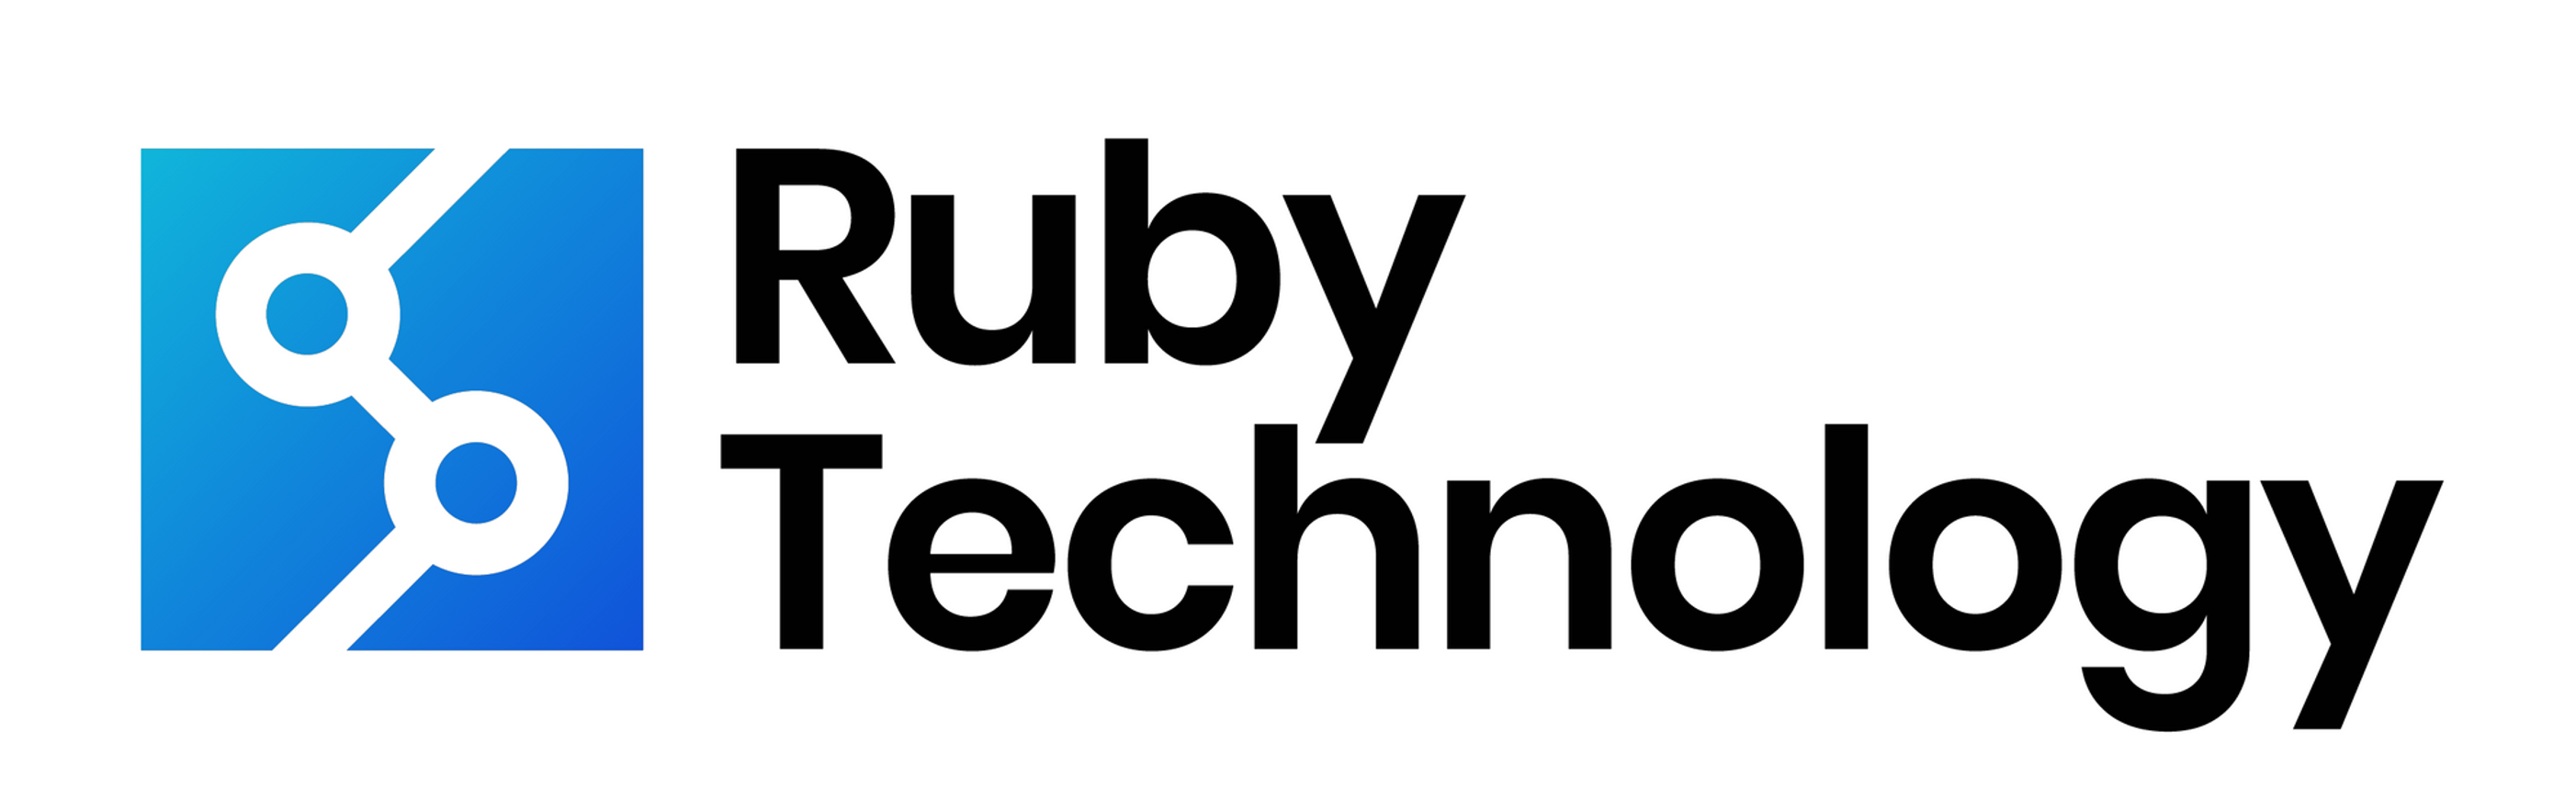 Ruby Technology